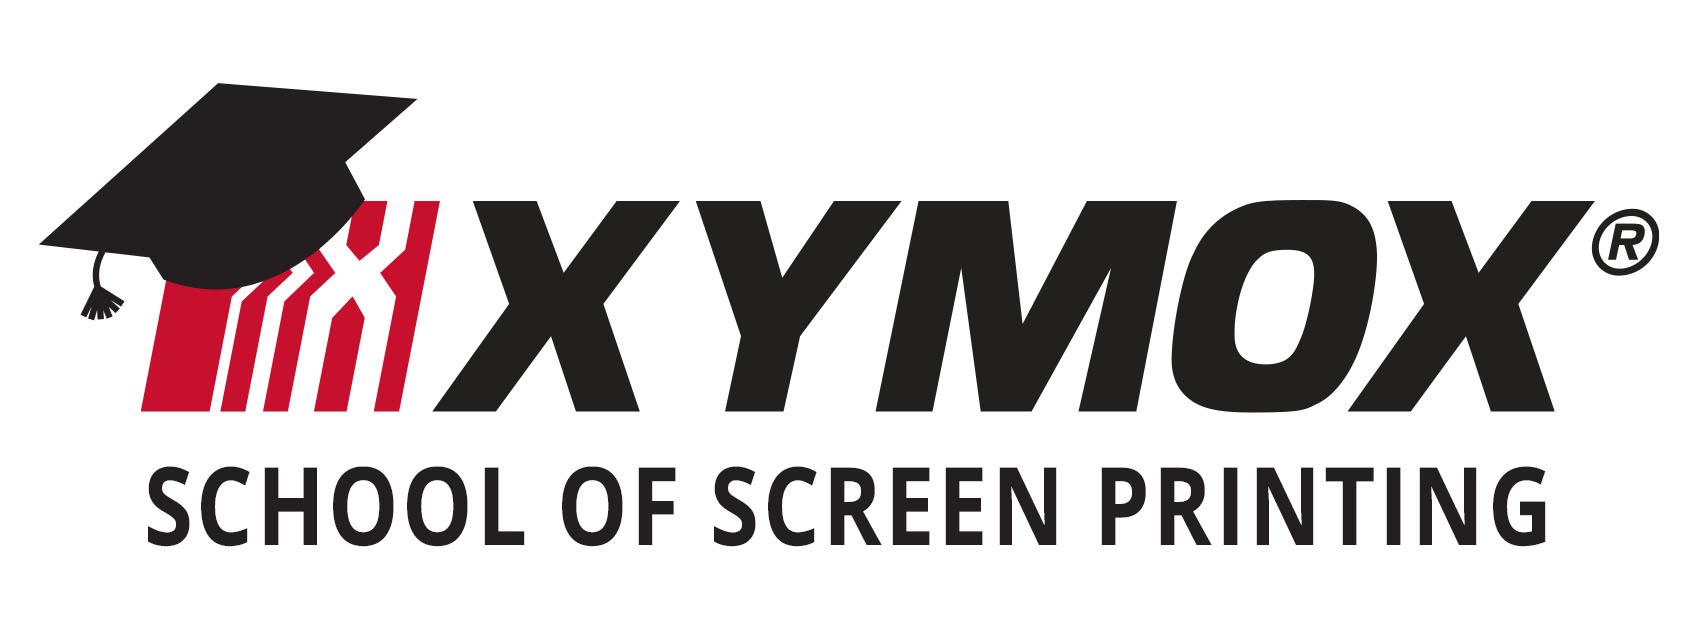 XSSP logo